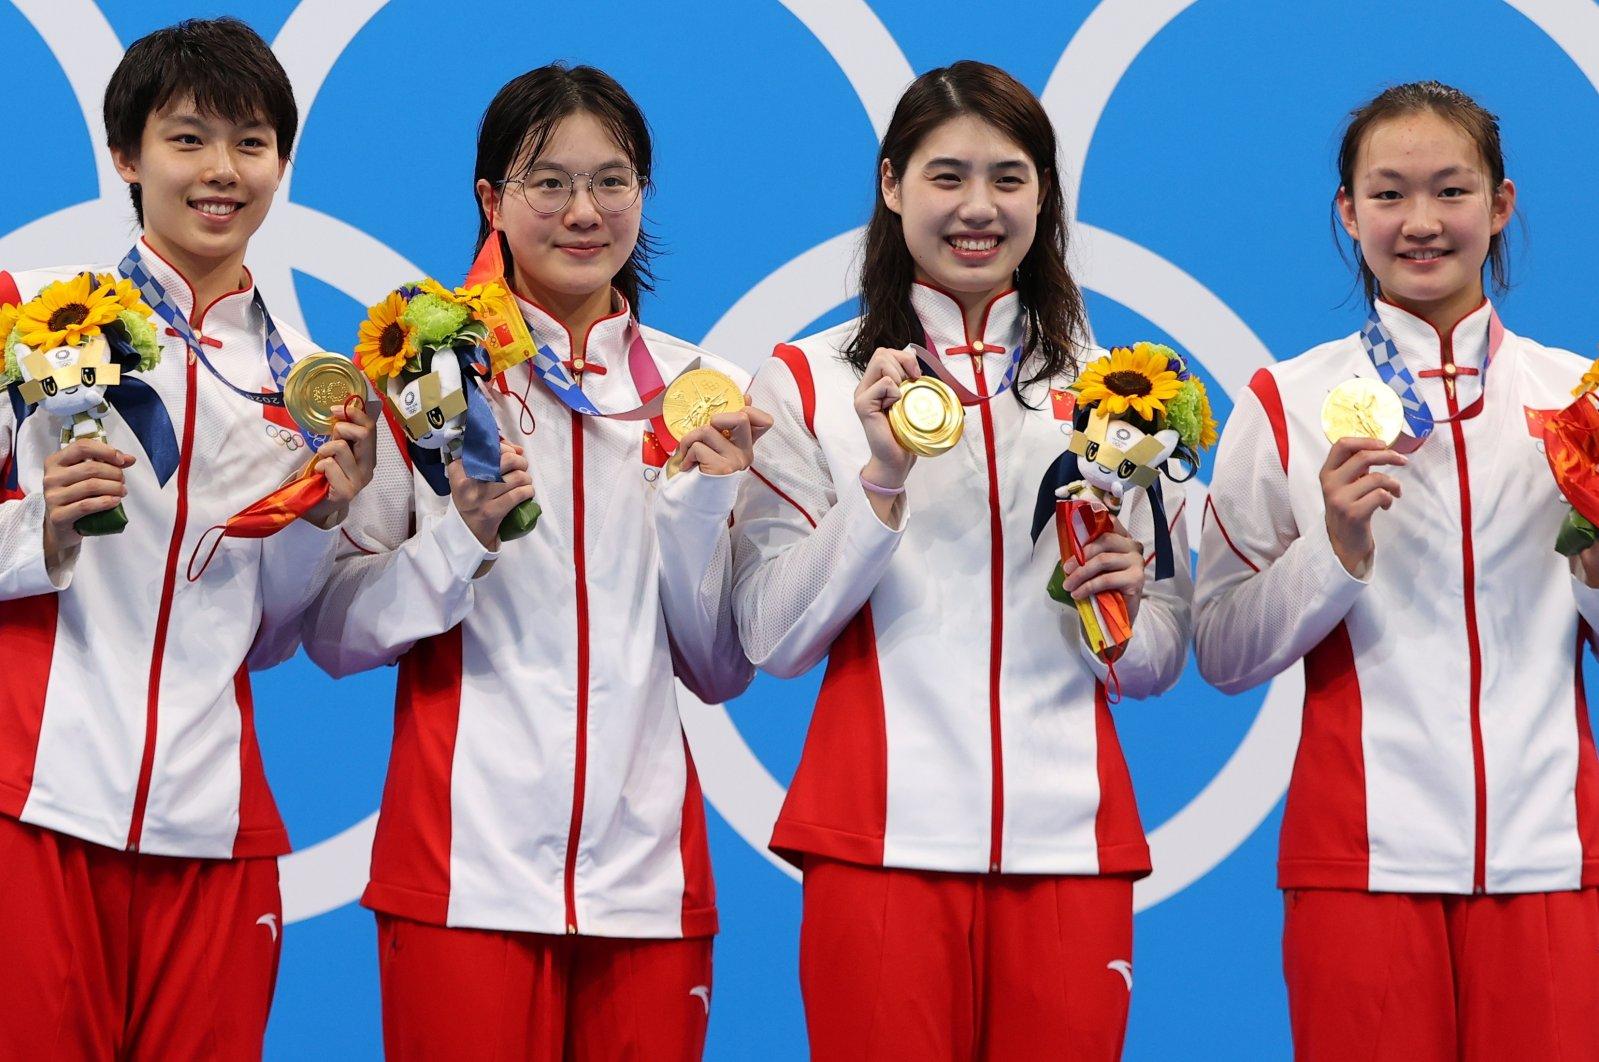 (From L to R) Women's 4 x 200-meter Freestyle Relay gold medallists China's Yang Junxuan, Tang Muhan, Zhang Yufei and Li Bingjie celebrate on the podium, Tokyo Aquatics Centre, Tokyo, Japan - July 29, 2021.